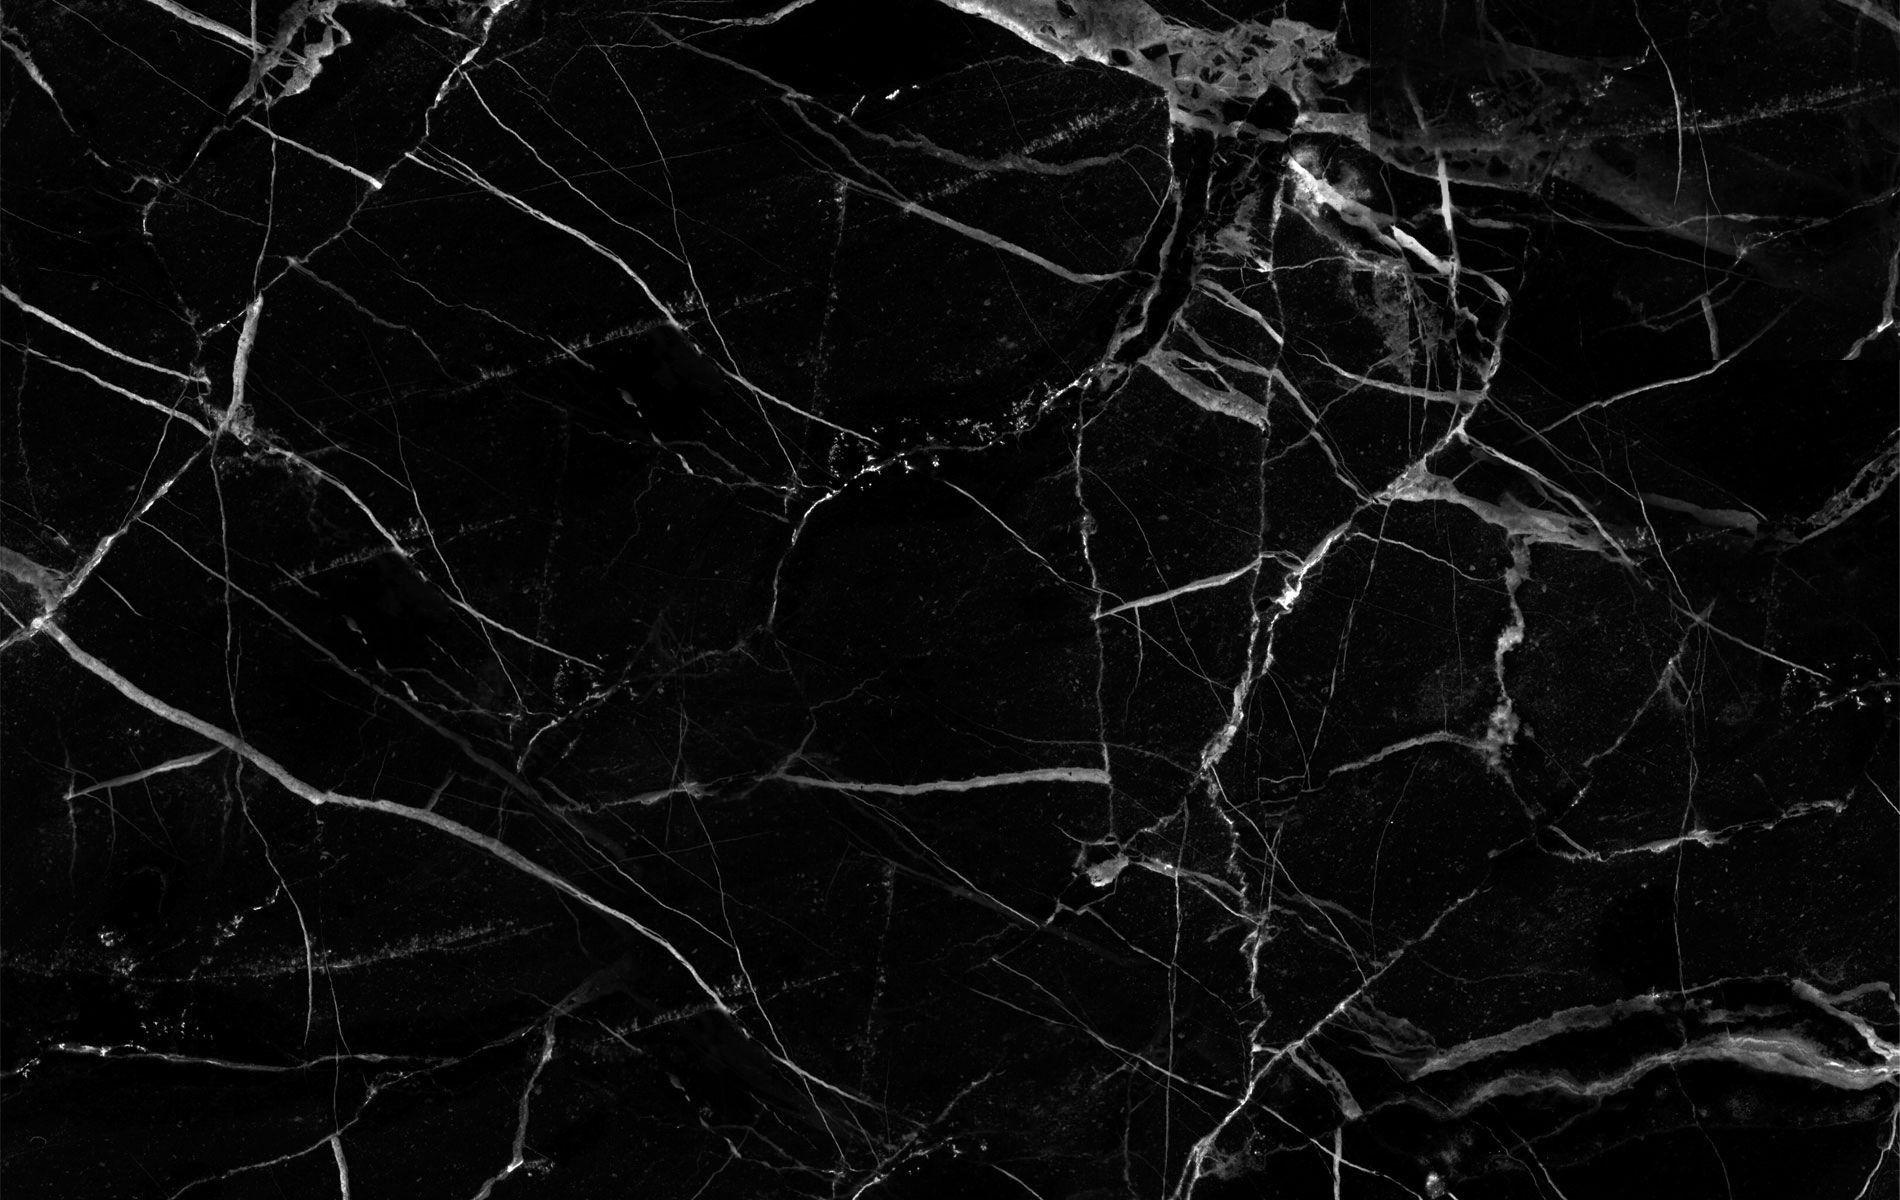 76 Black Desktop Wallpaper Tumblr Quotes In 2020 Marble Desktop Wallpaper Aesthetic Desktop Wallpaper Black Marble Background